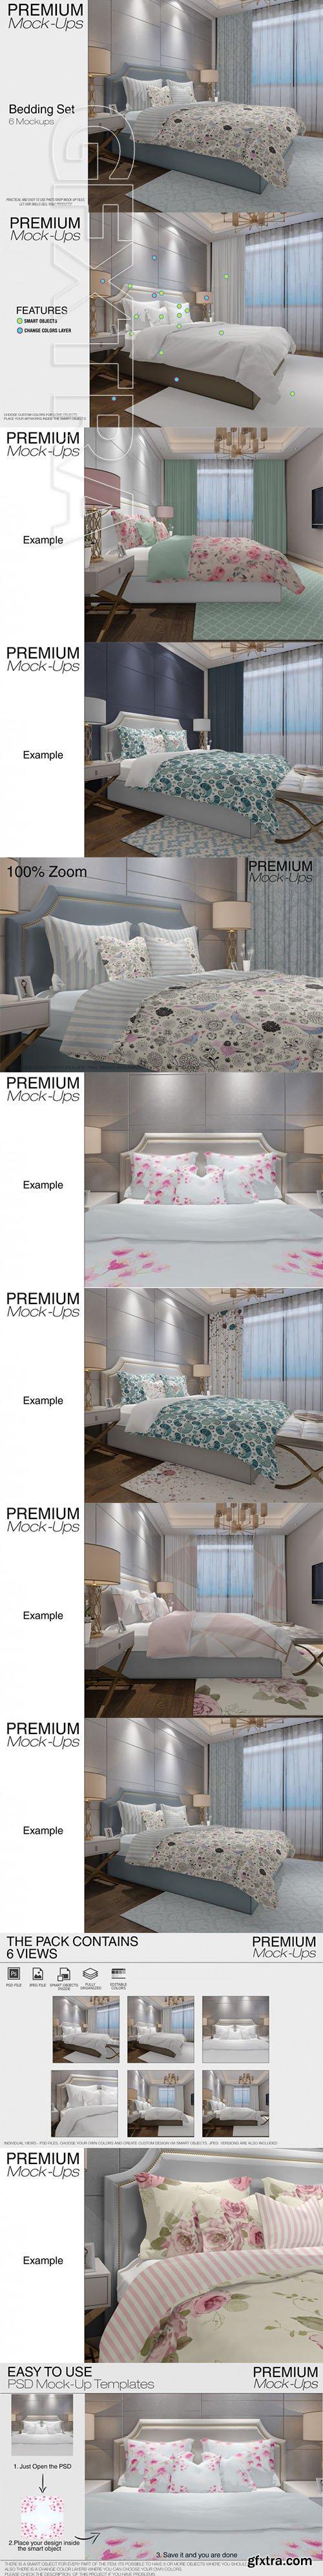 Graphicriver - Bedding Mockup Set 22101321